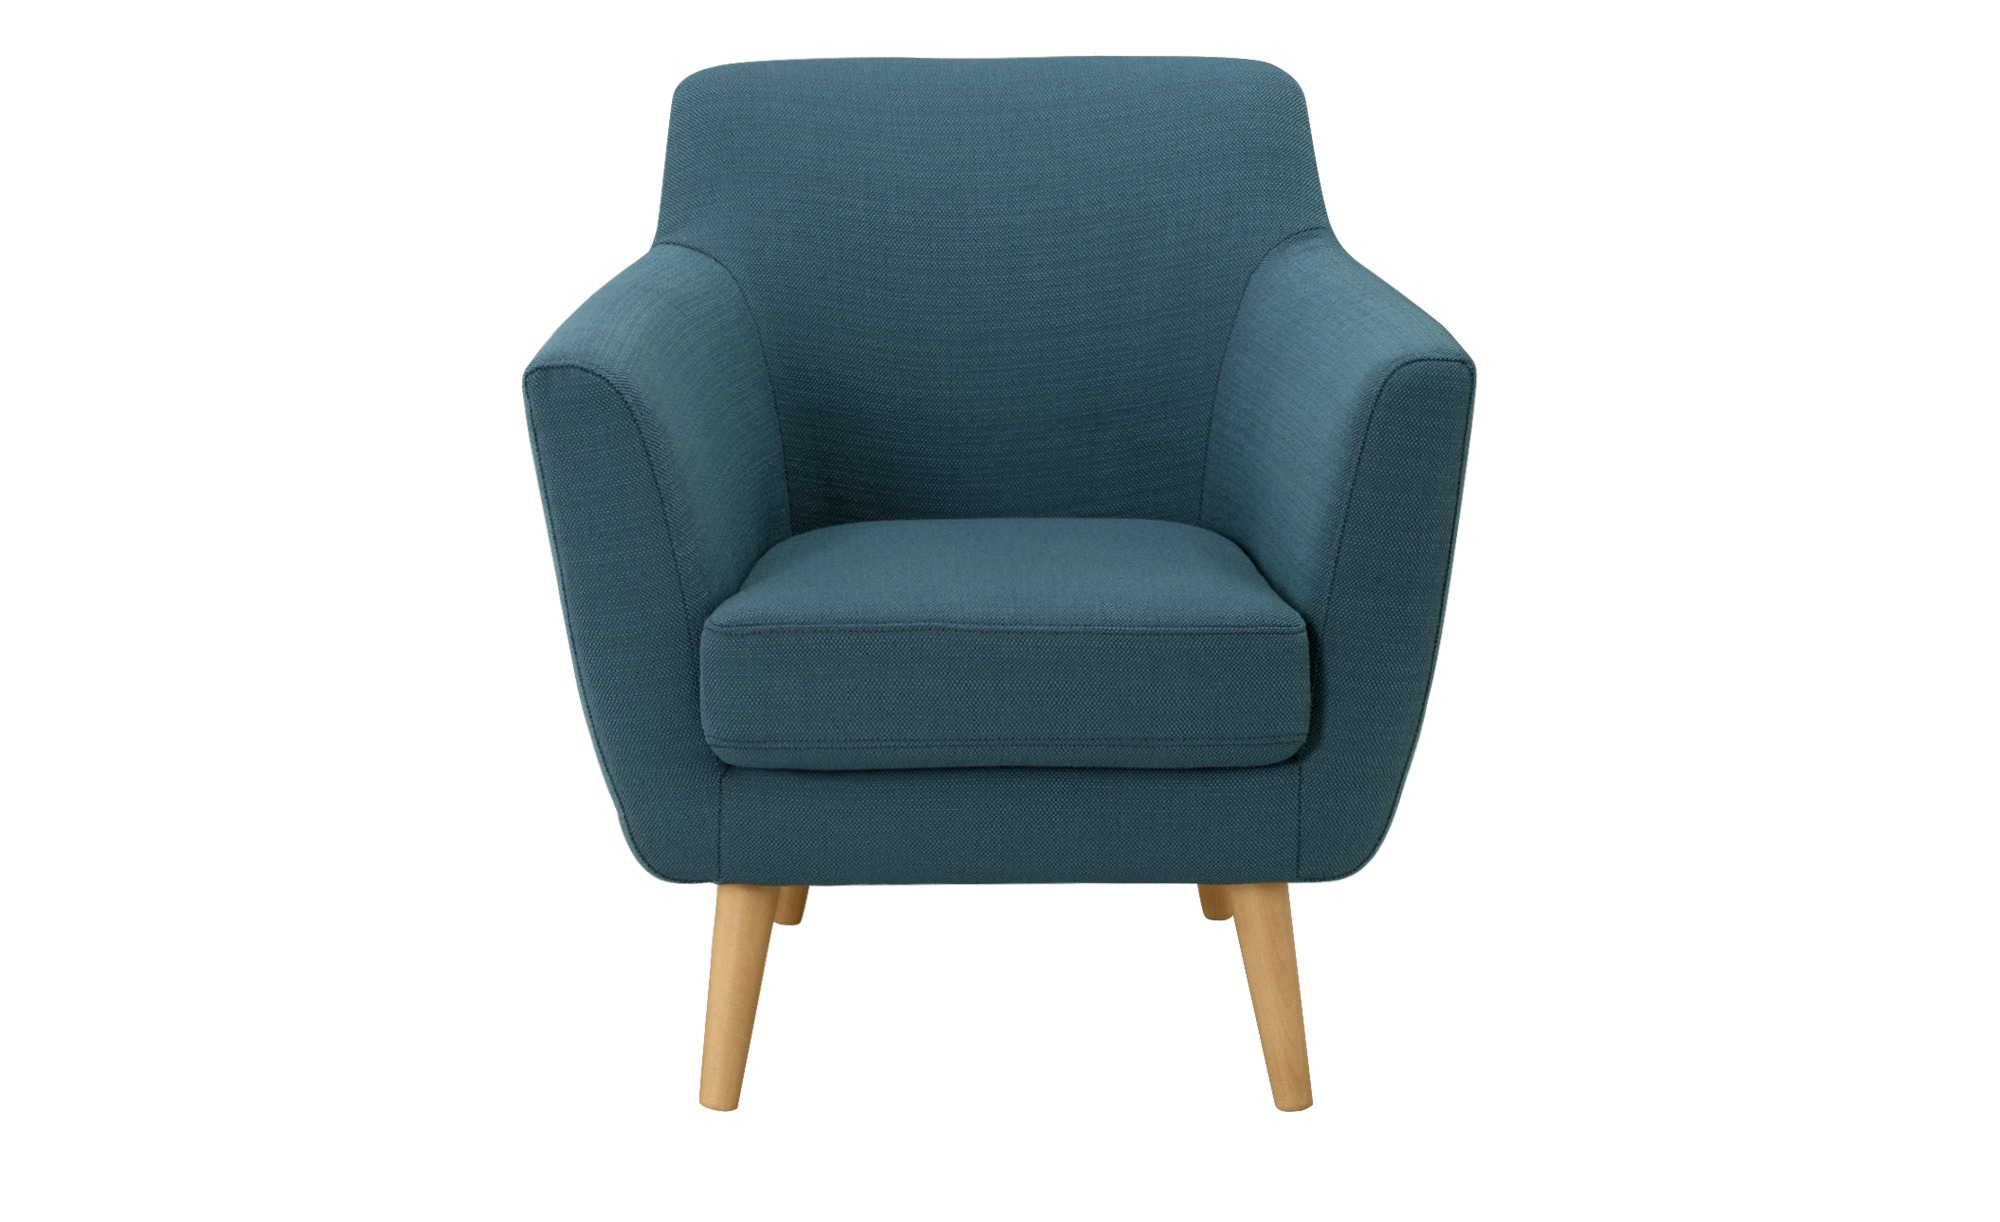 SOHO Sessel petrol - Stoff Dagny ¦ türkis/petrol ¦ Maße (cm): B: 74 H: 78 T: 75 Polstermöbel > Sessel > Polstersessel - Höffner